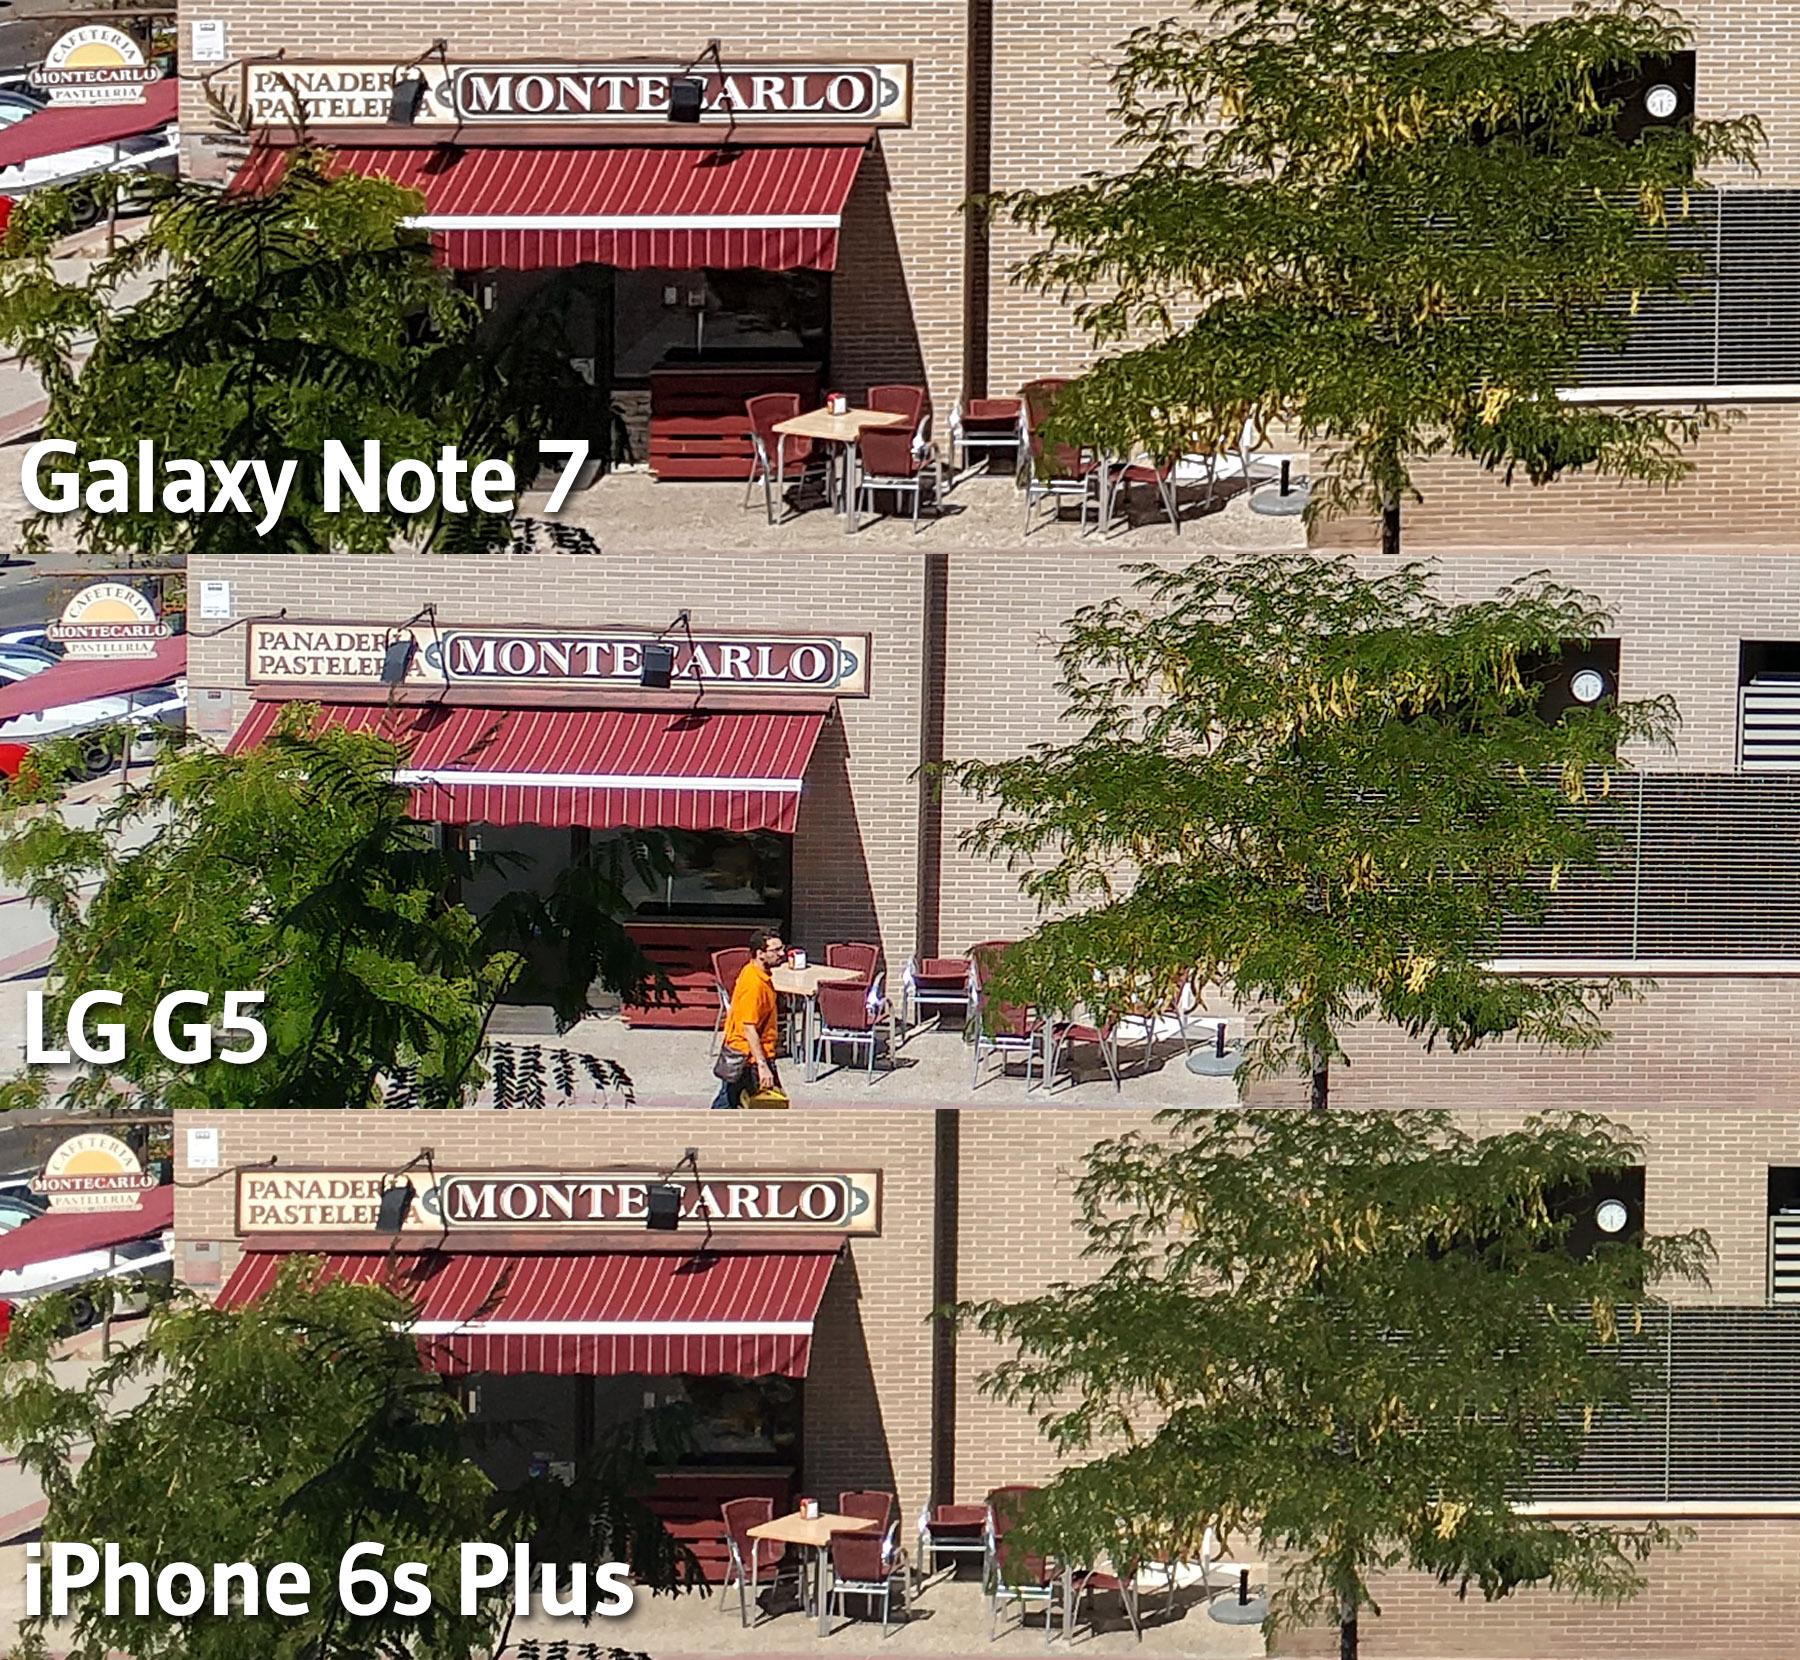 Comparativas fotos dia - Galaxy Note 7 - LG G5 - iPhone 6s Plus